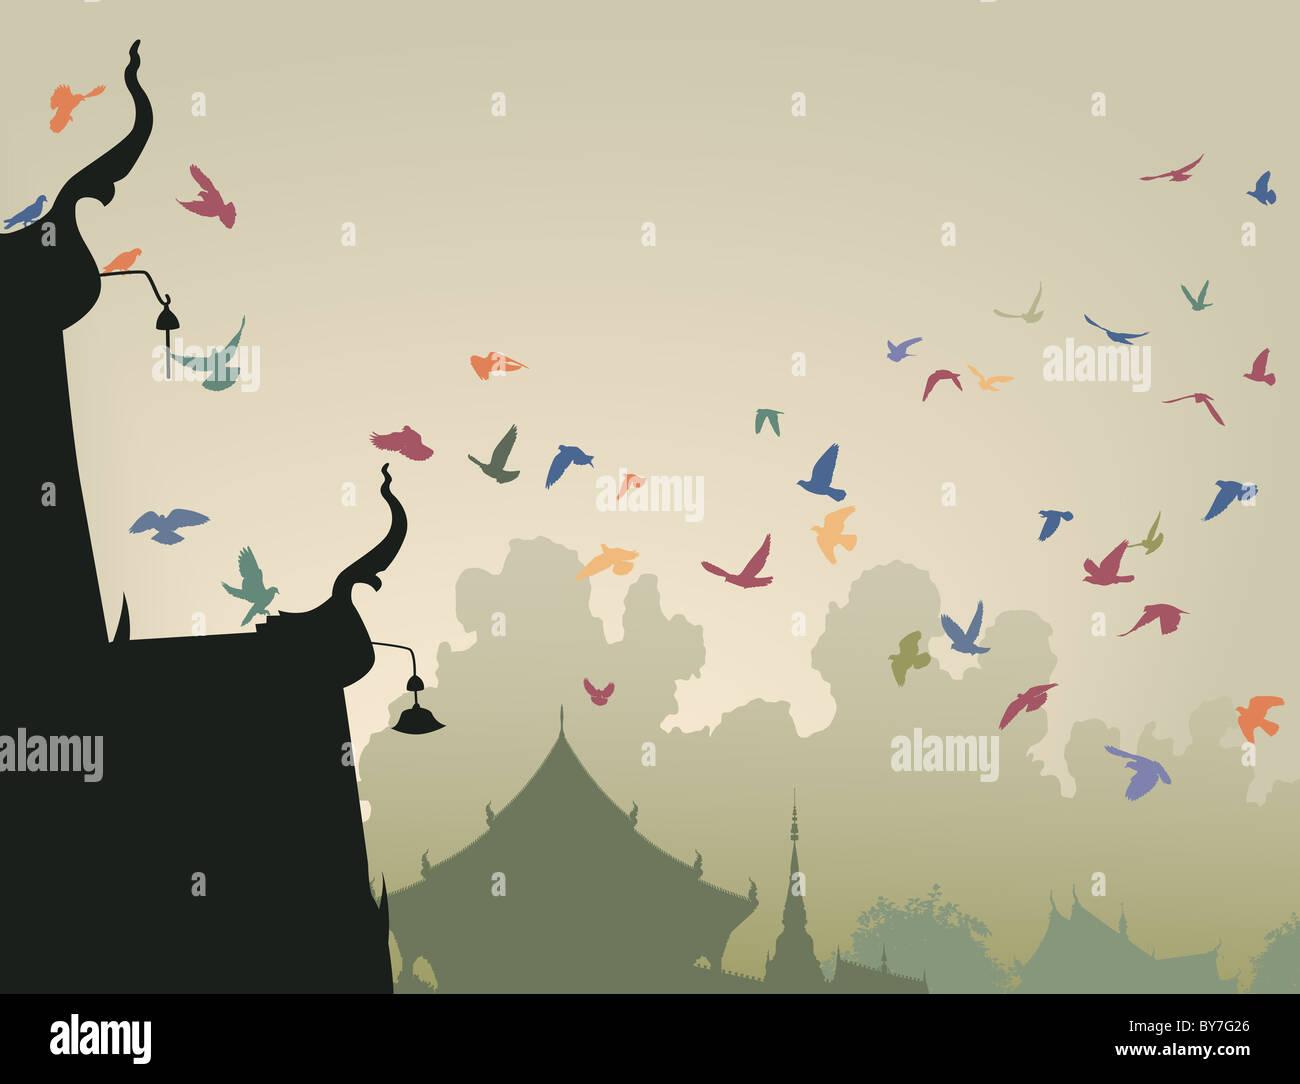 Ilustración de coloridas palomas volando a un templo budista techoFoto de stock